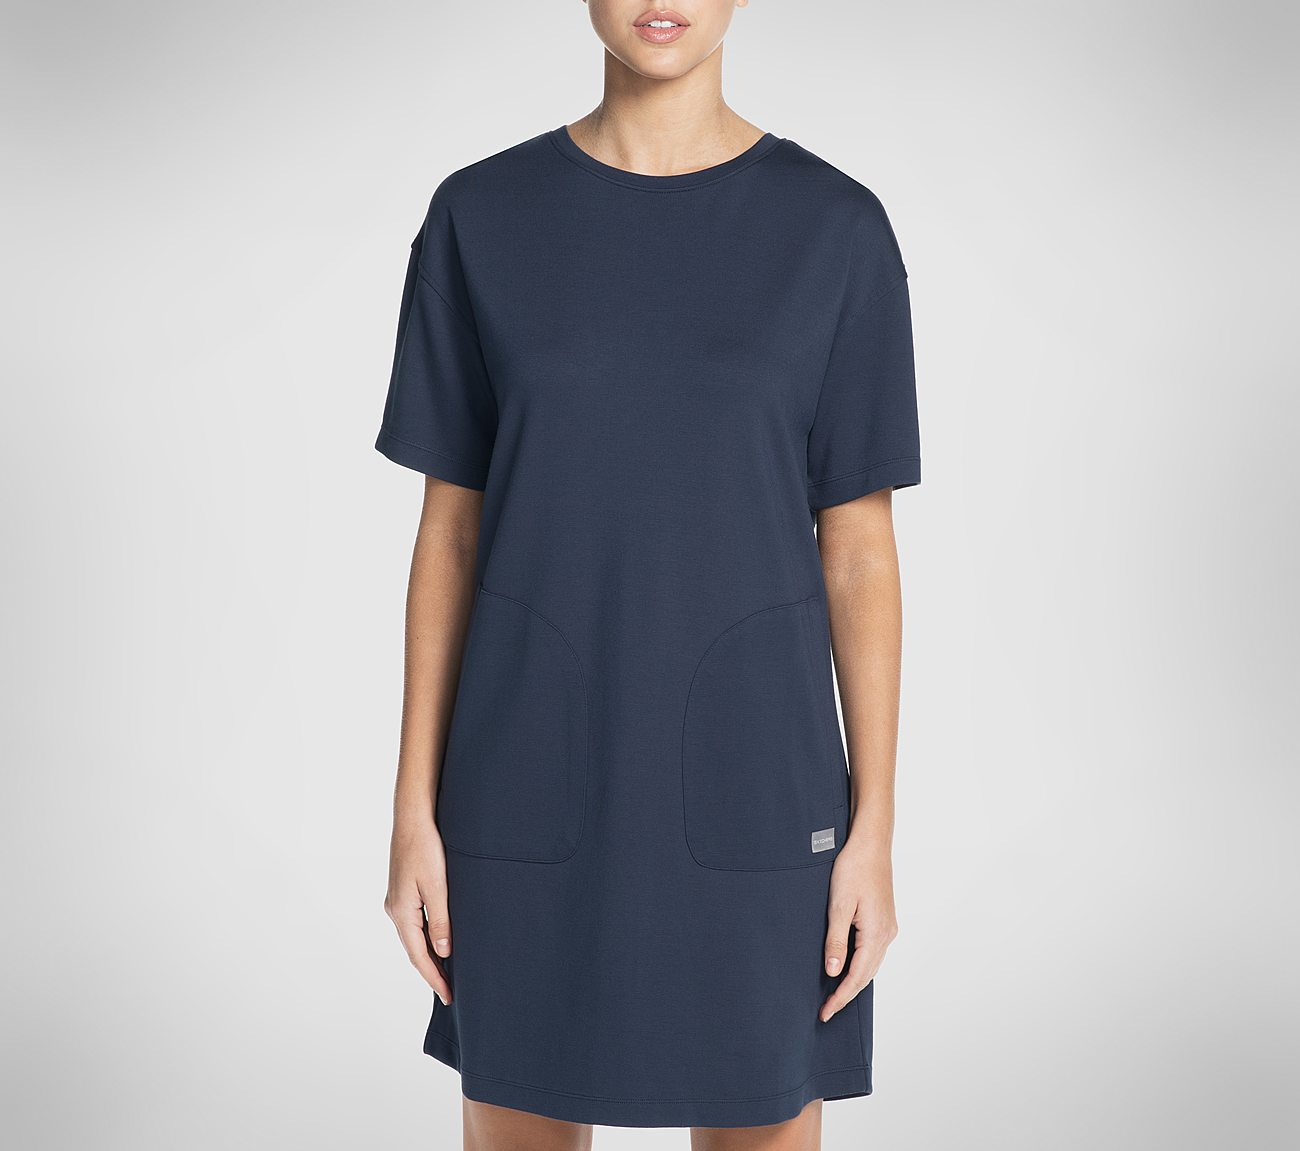 Mindful Dress